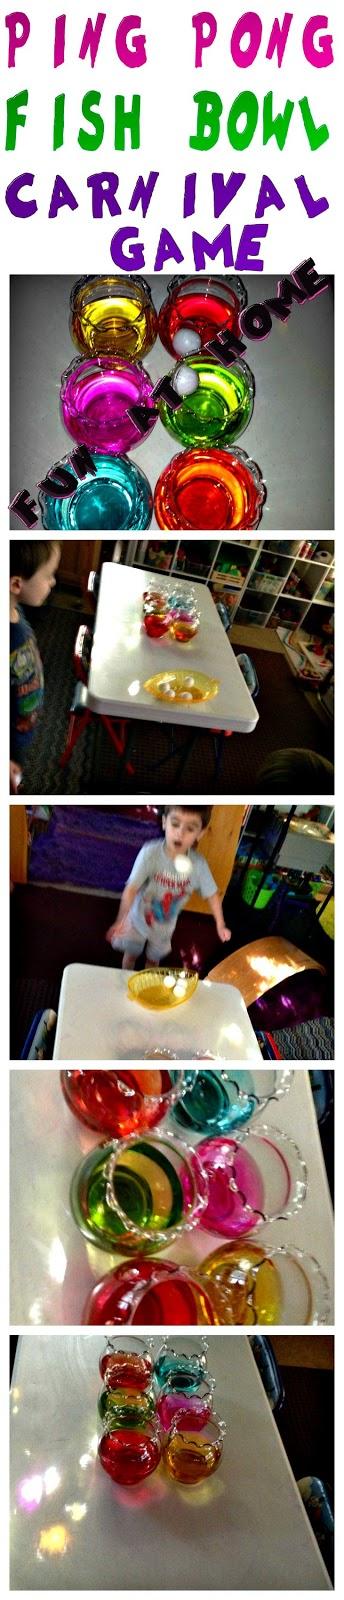 Ping Pong Fish Bowl Toss Epic Childhood